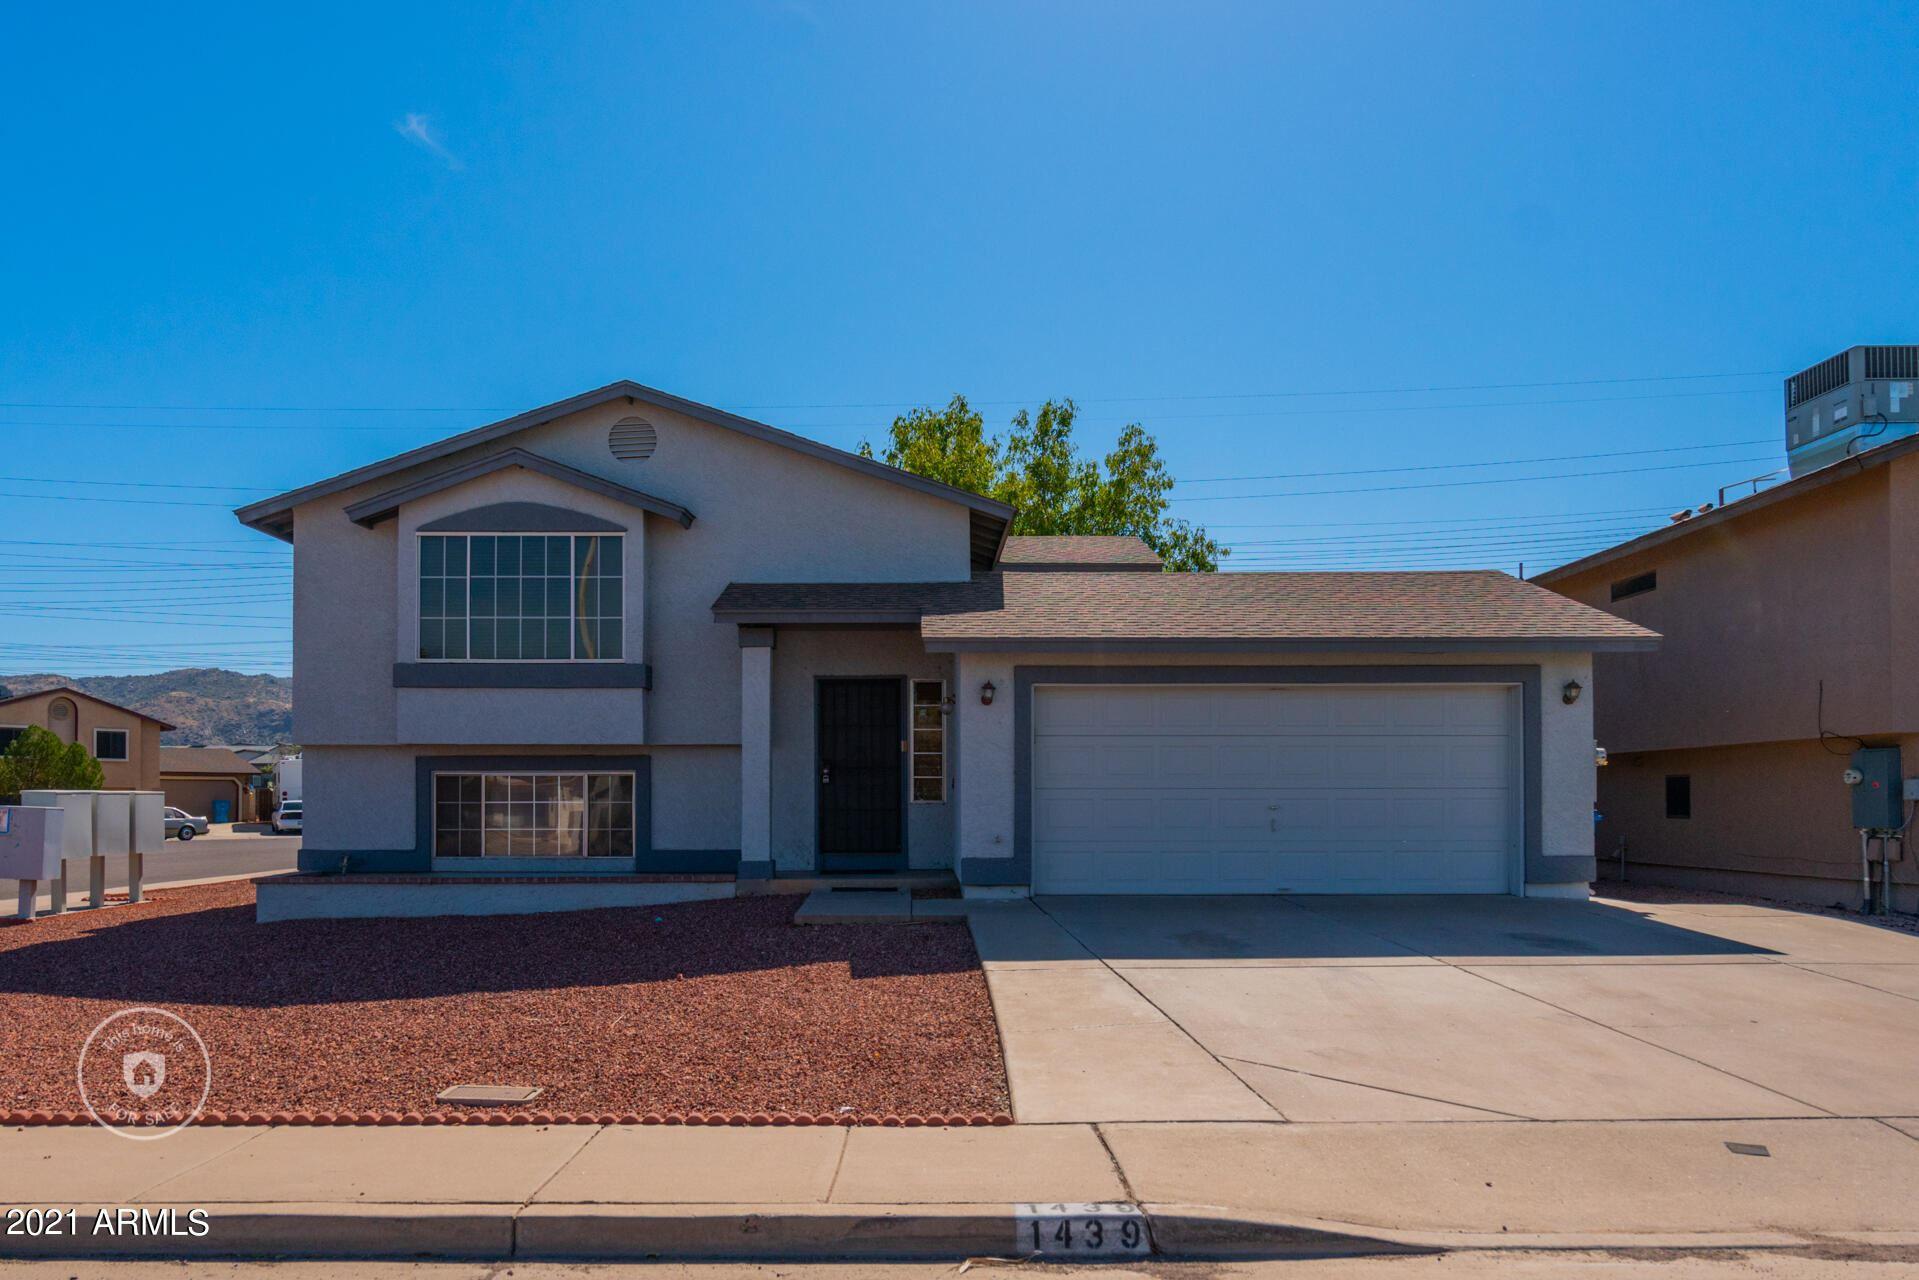 1439 E FREMONT Road, Phoenix, AZ 85042 - MLS#: 6311163